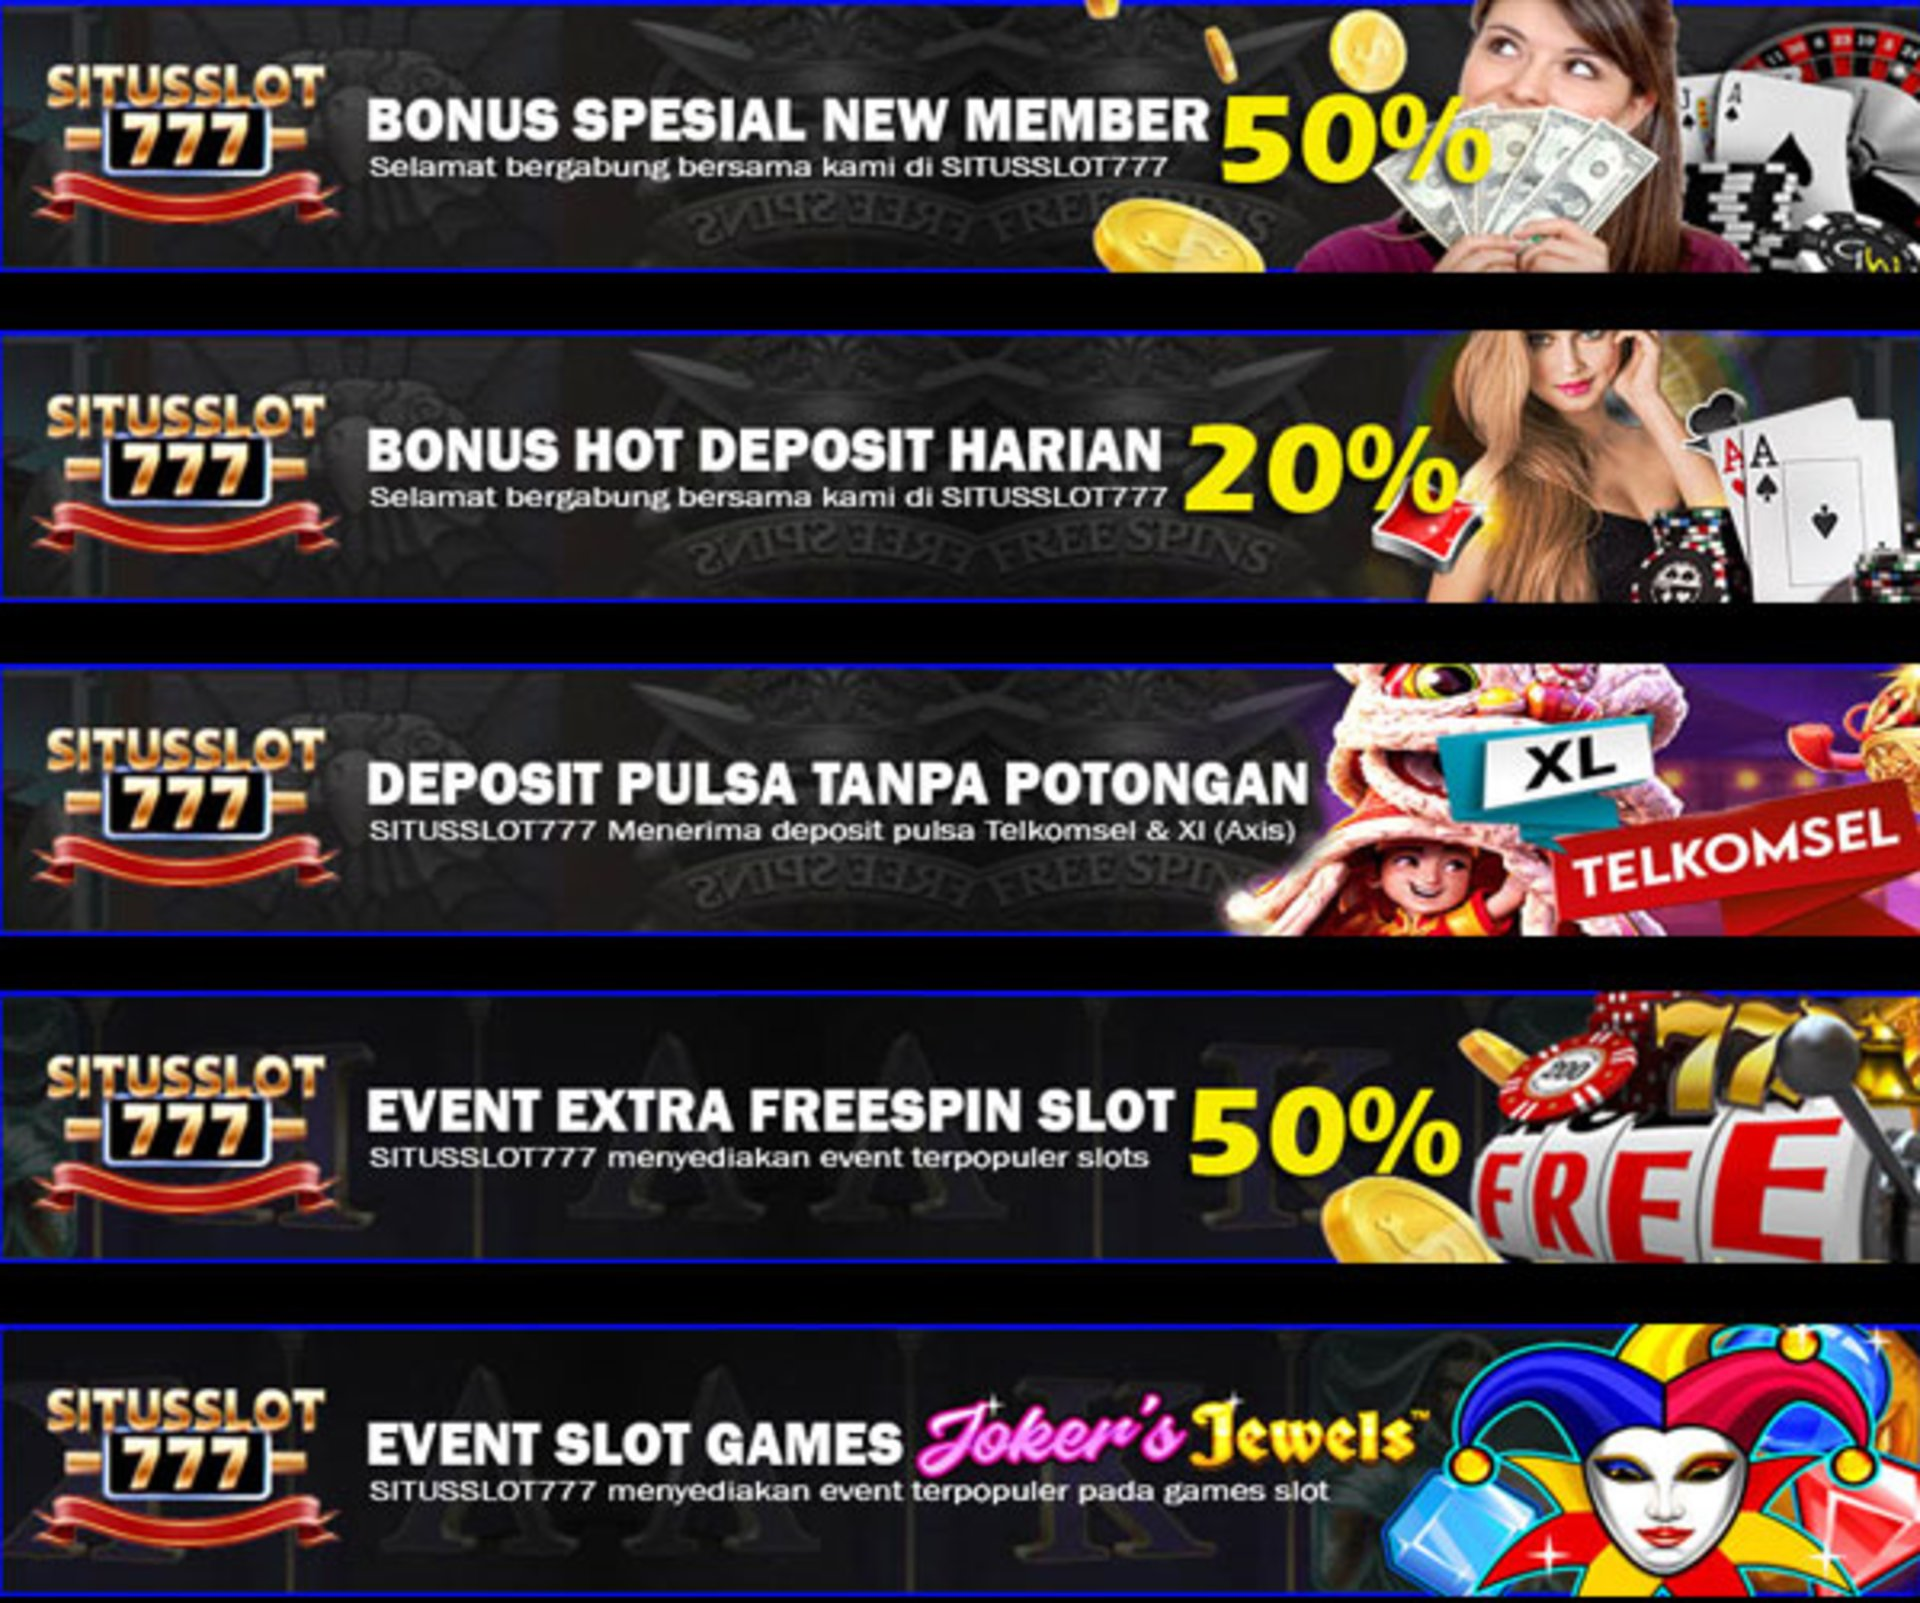 Judi Poker Online Deposit Pulsa Tanpa Potongan Agen Poker Deposit Pulsa Tanpa Potongan